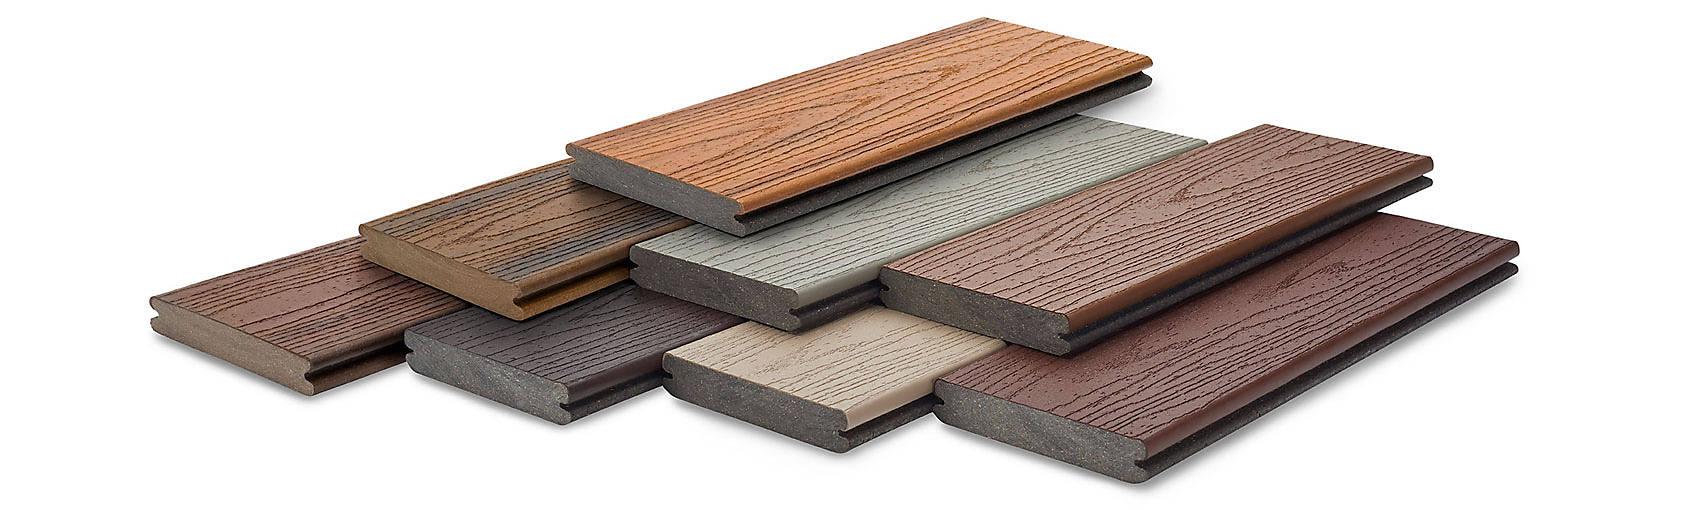 Composite Decking | Composite Deck Materials | Trex